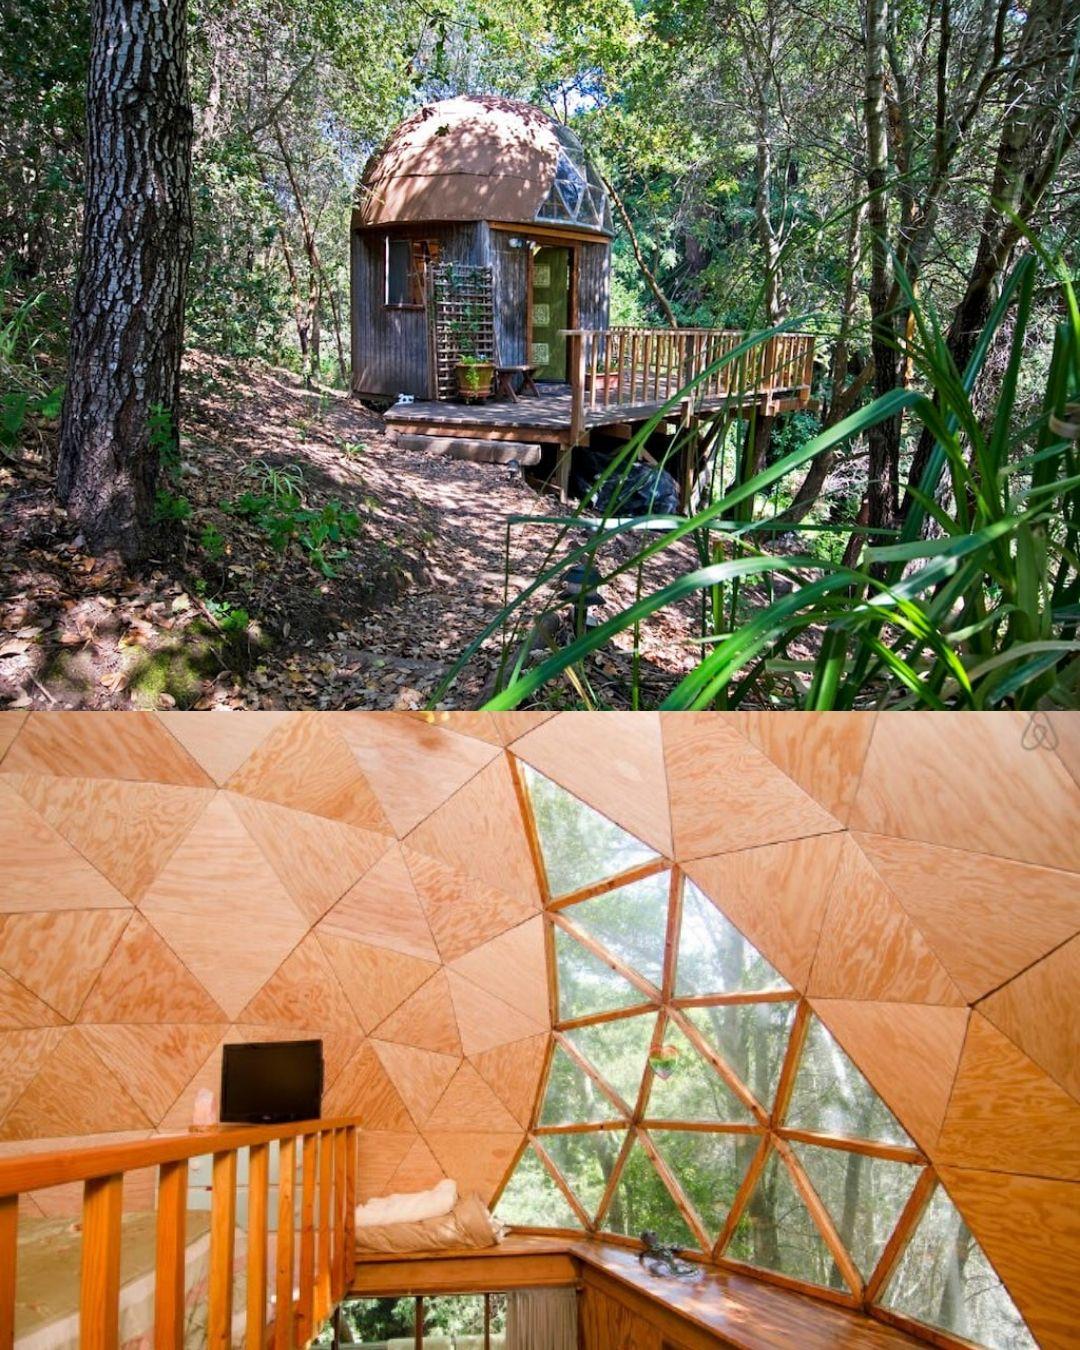 Corrugated Metal Mushroom Dome Tiny House Rental